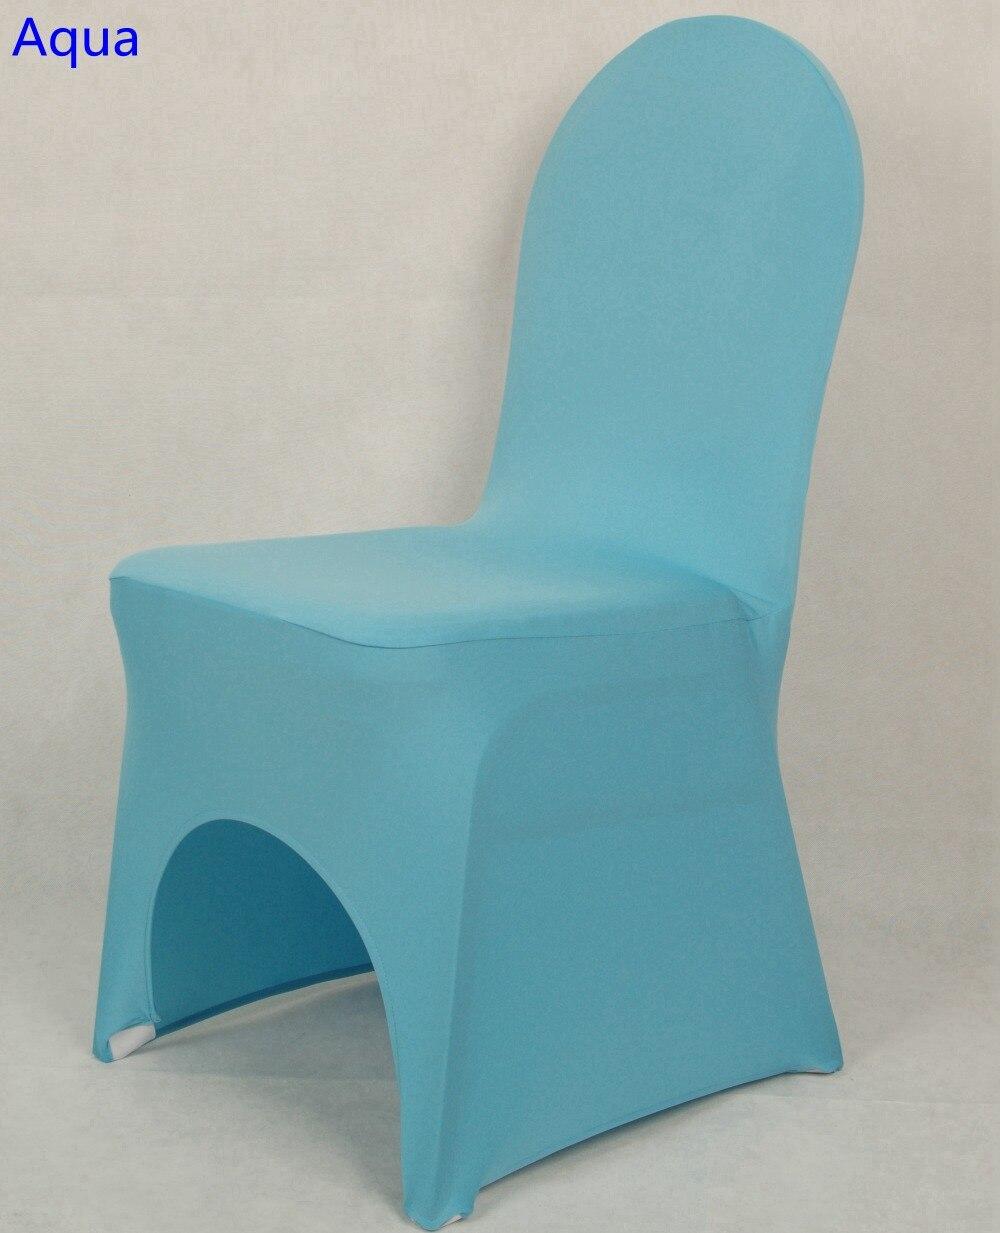 Aqua Colour Chair Covers Spandex Chair Covers China